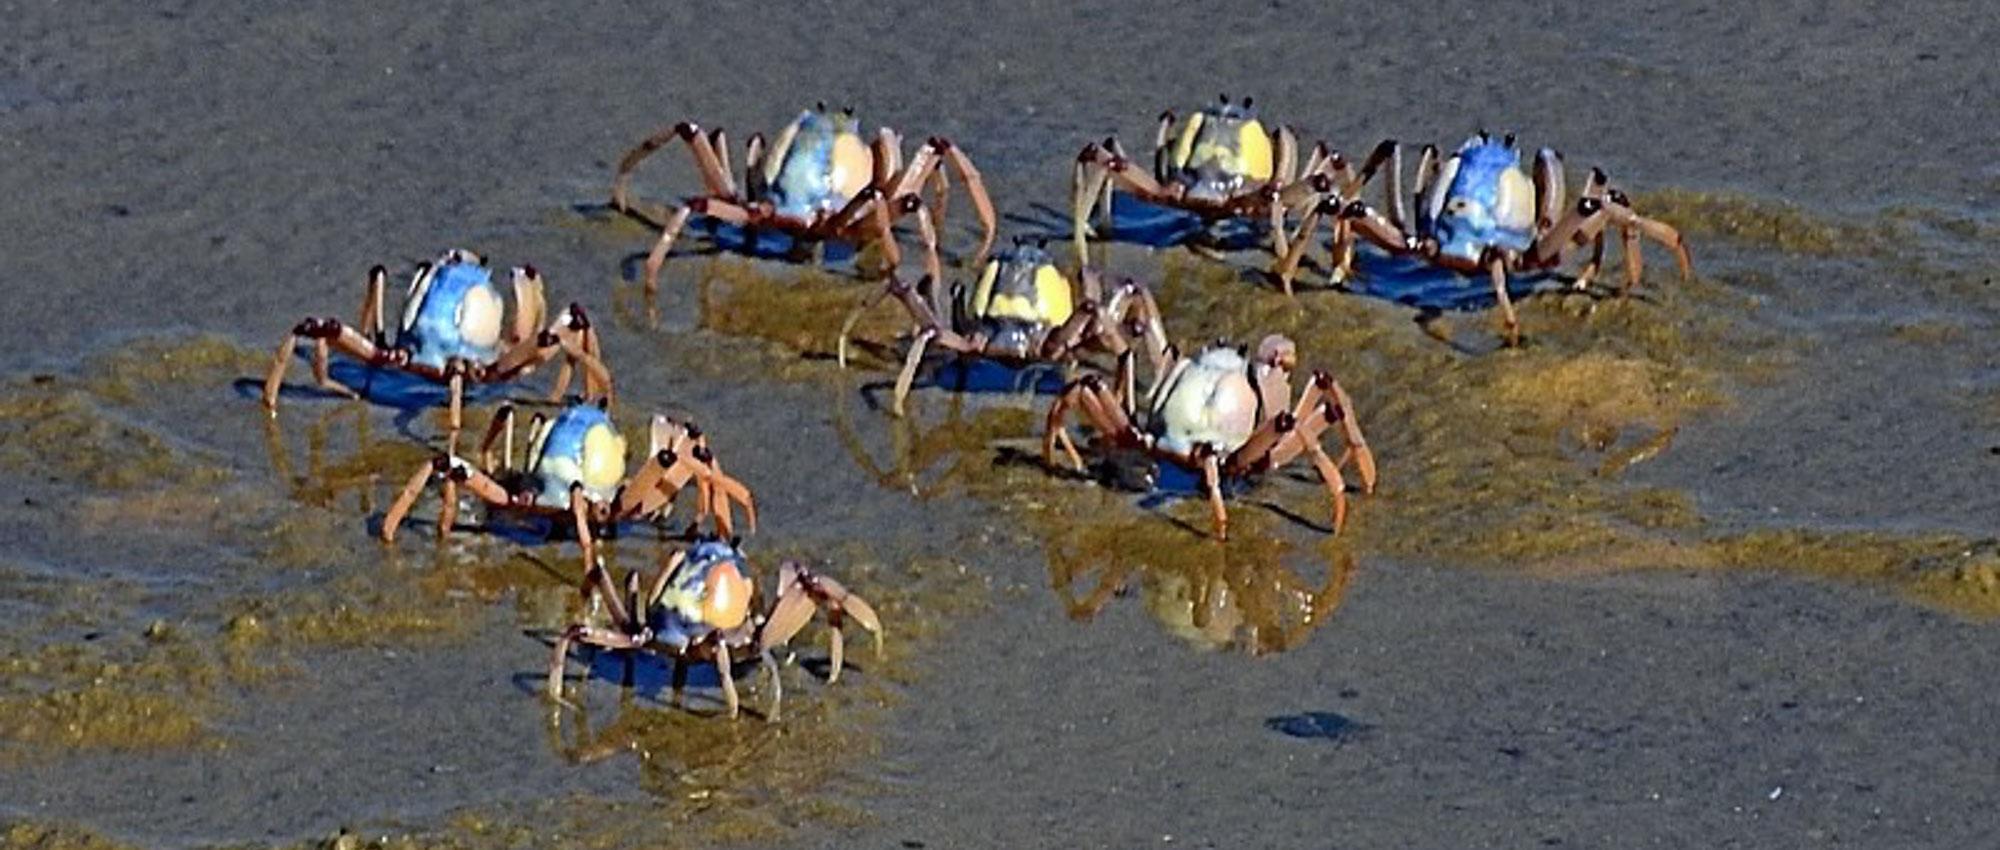 Mictyris longicarpus  (Soldier Crab), Bermagui. Recorded on  NatureMapr  by Max Campbell, April 2018.